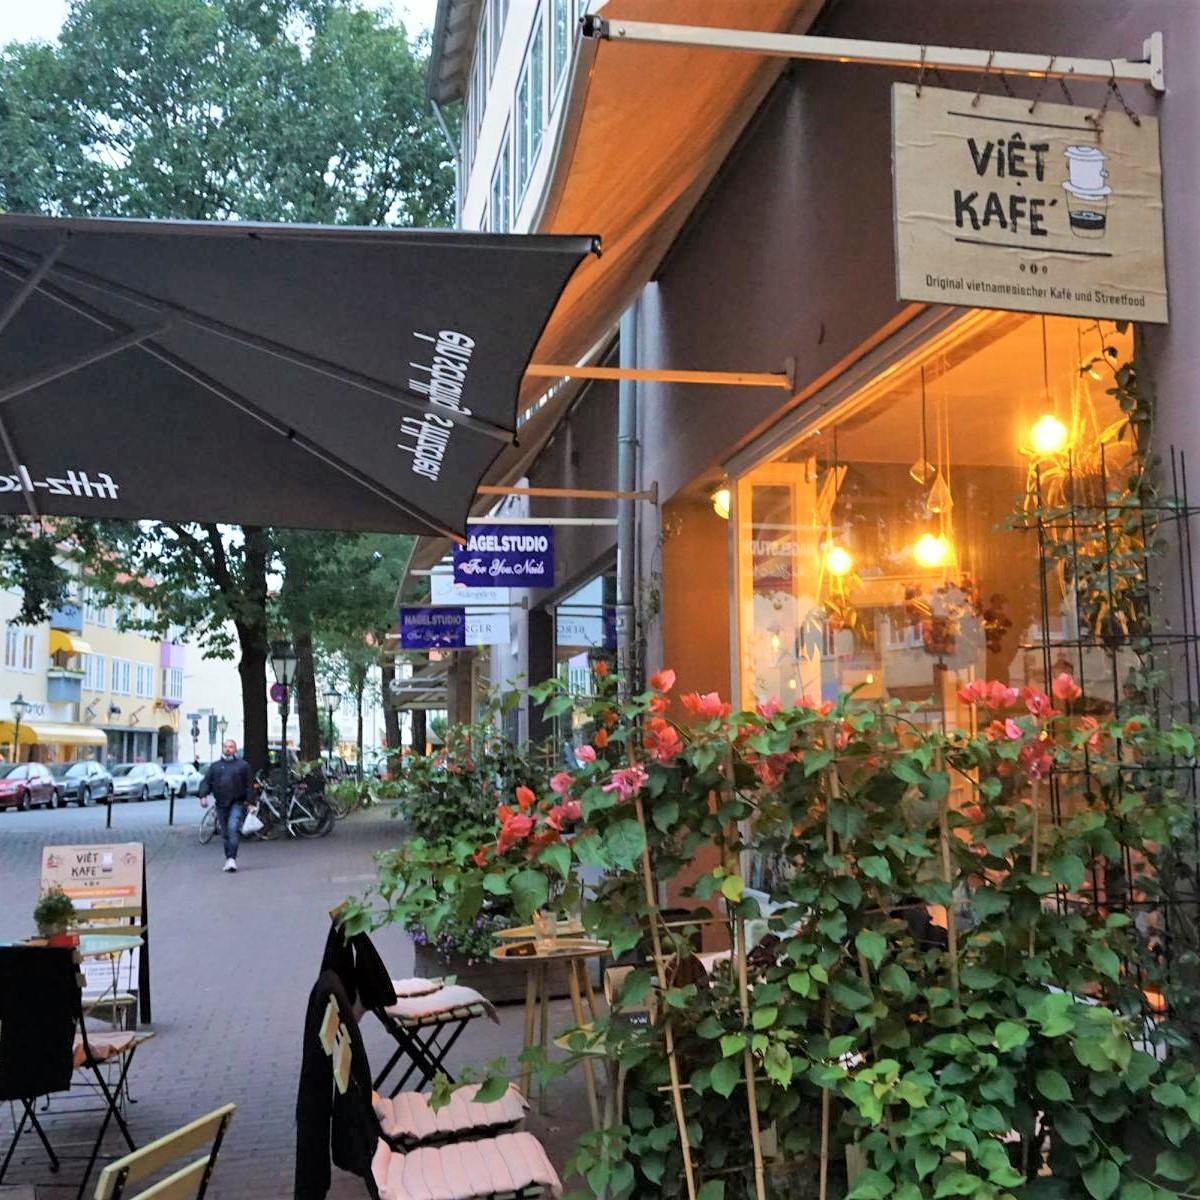 Style Hannover Viet Kafe B - Việt Kafé – 100% Vietnam